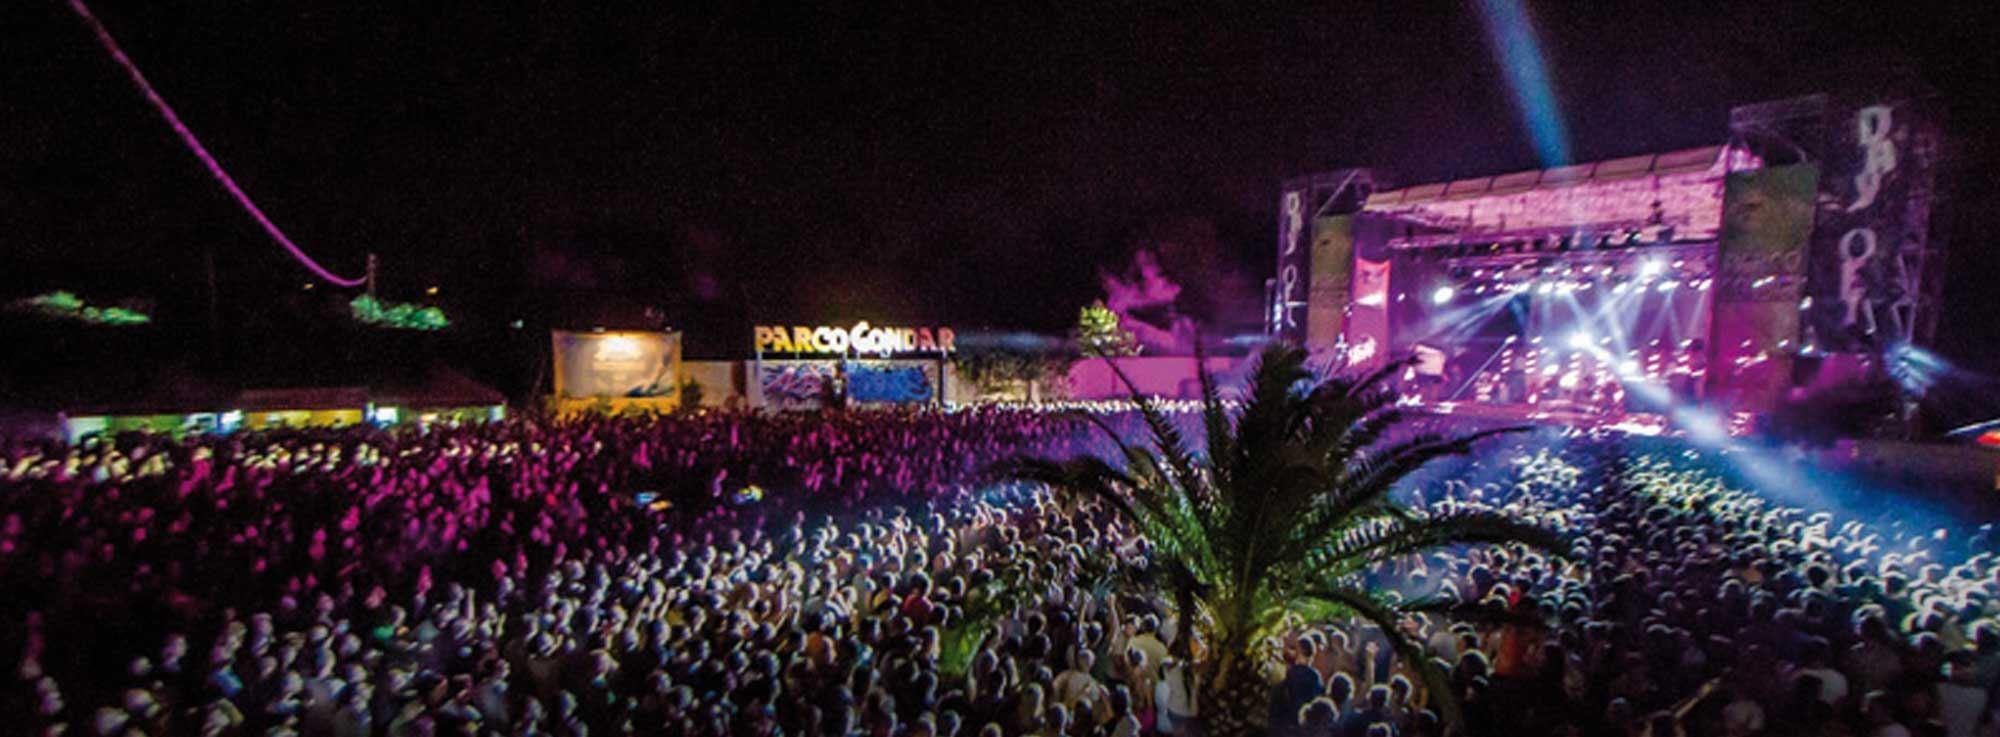 Gallipoli: Festival al Parco Gondar